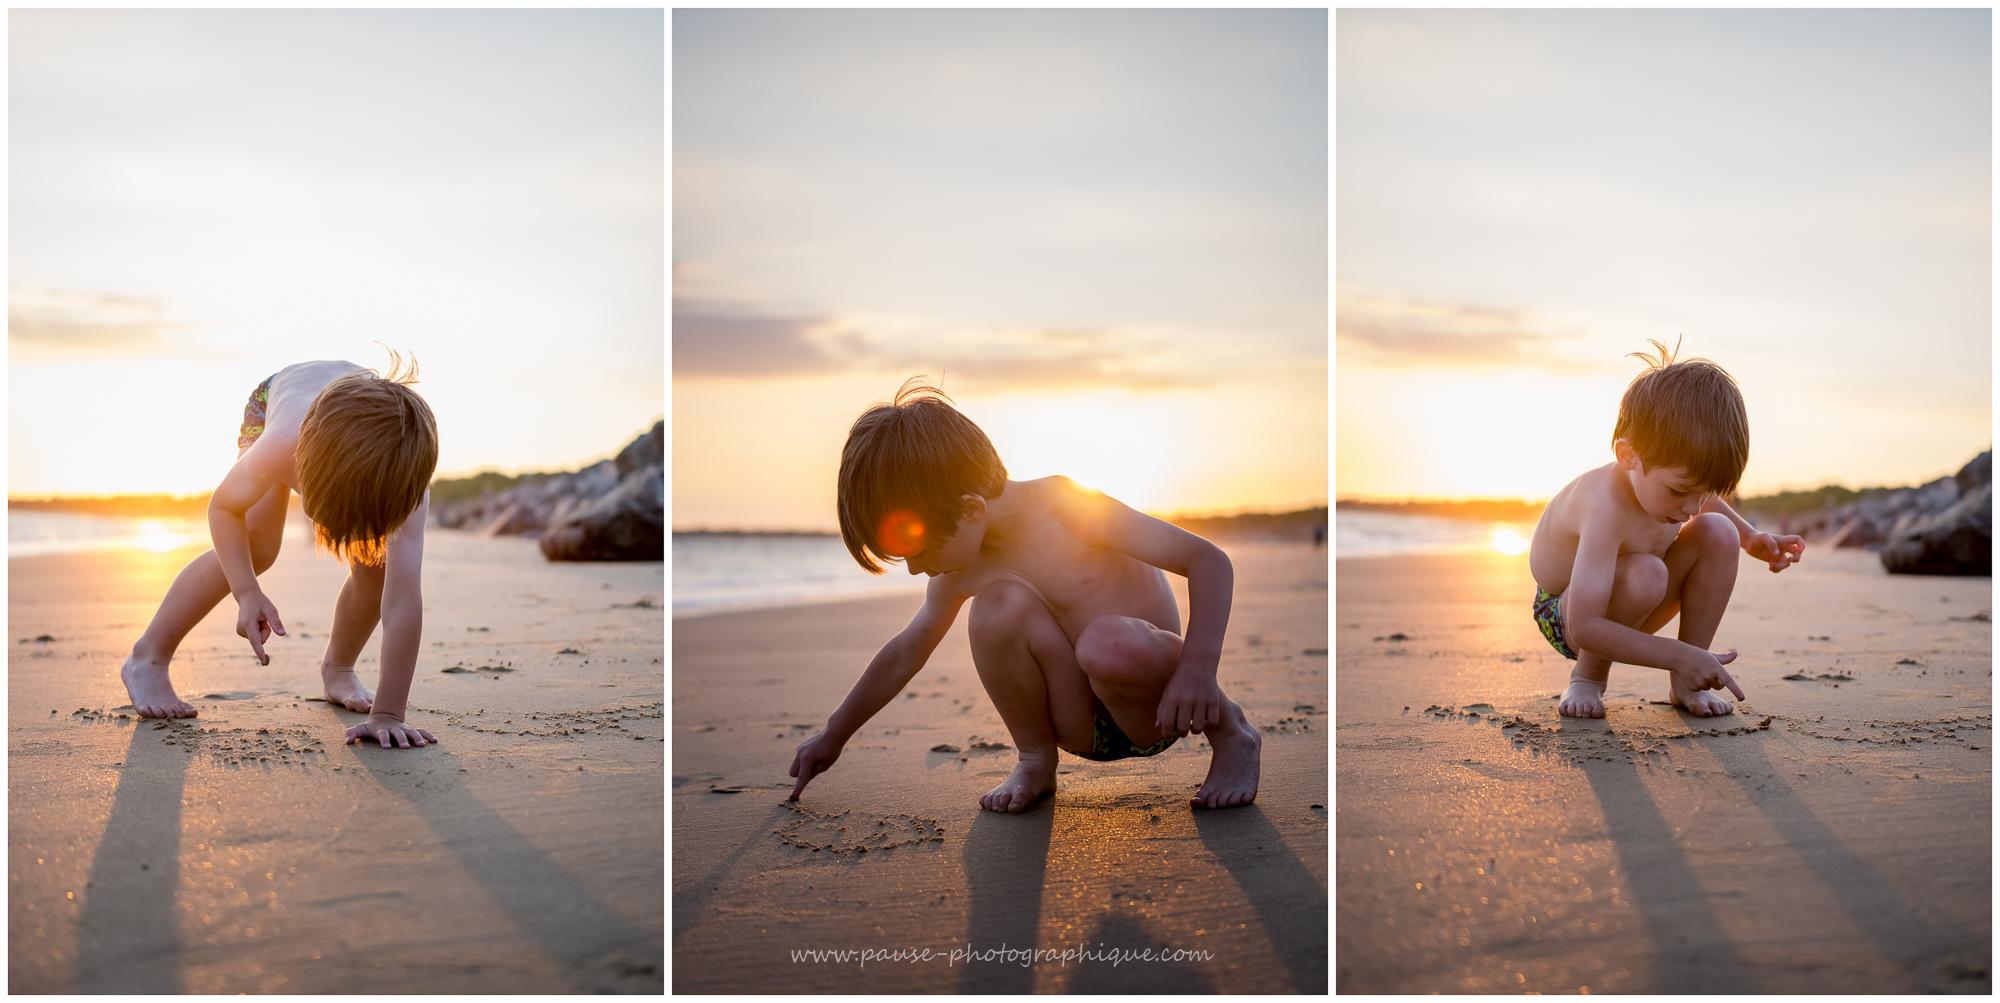 PhotographePortraitGloaguen-Max-9